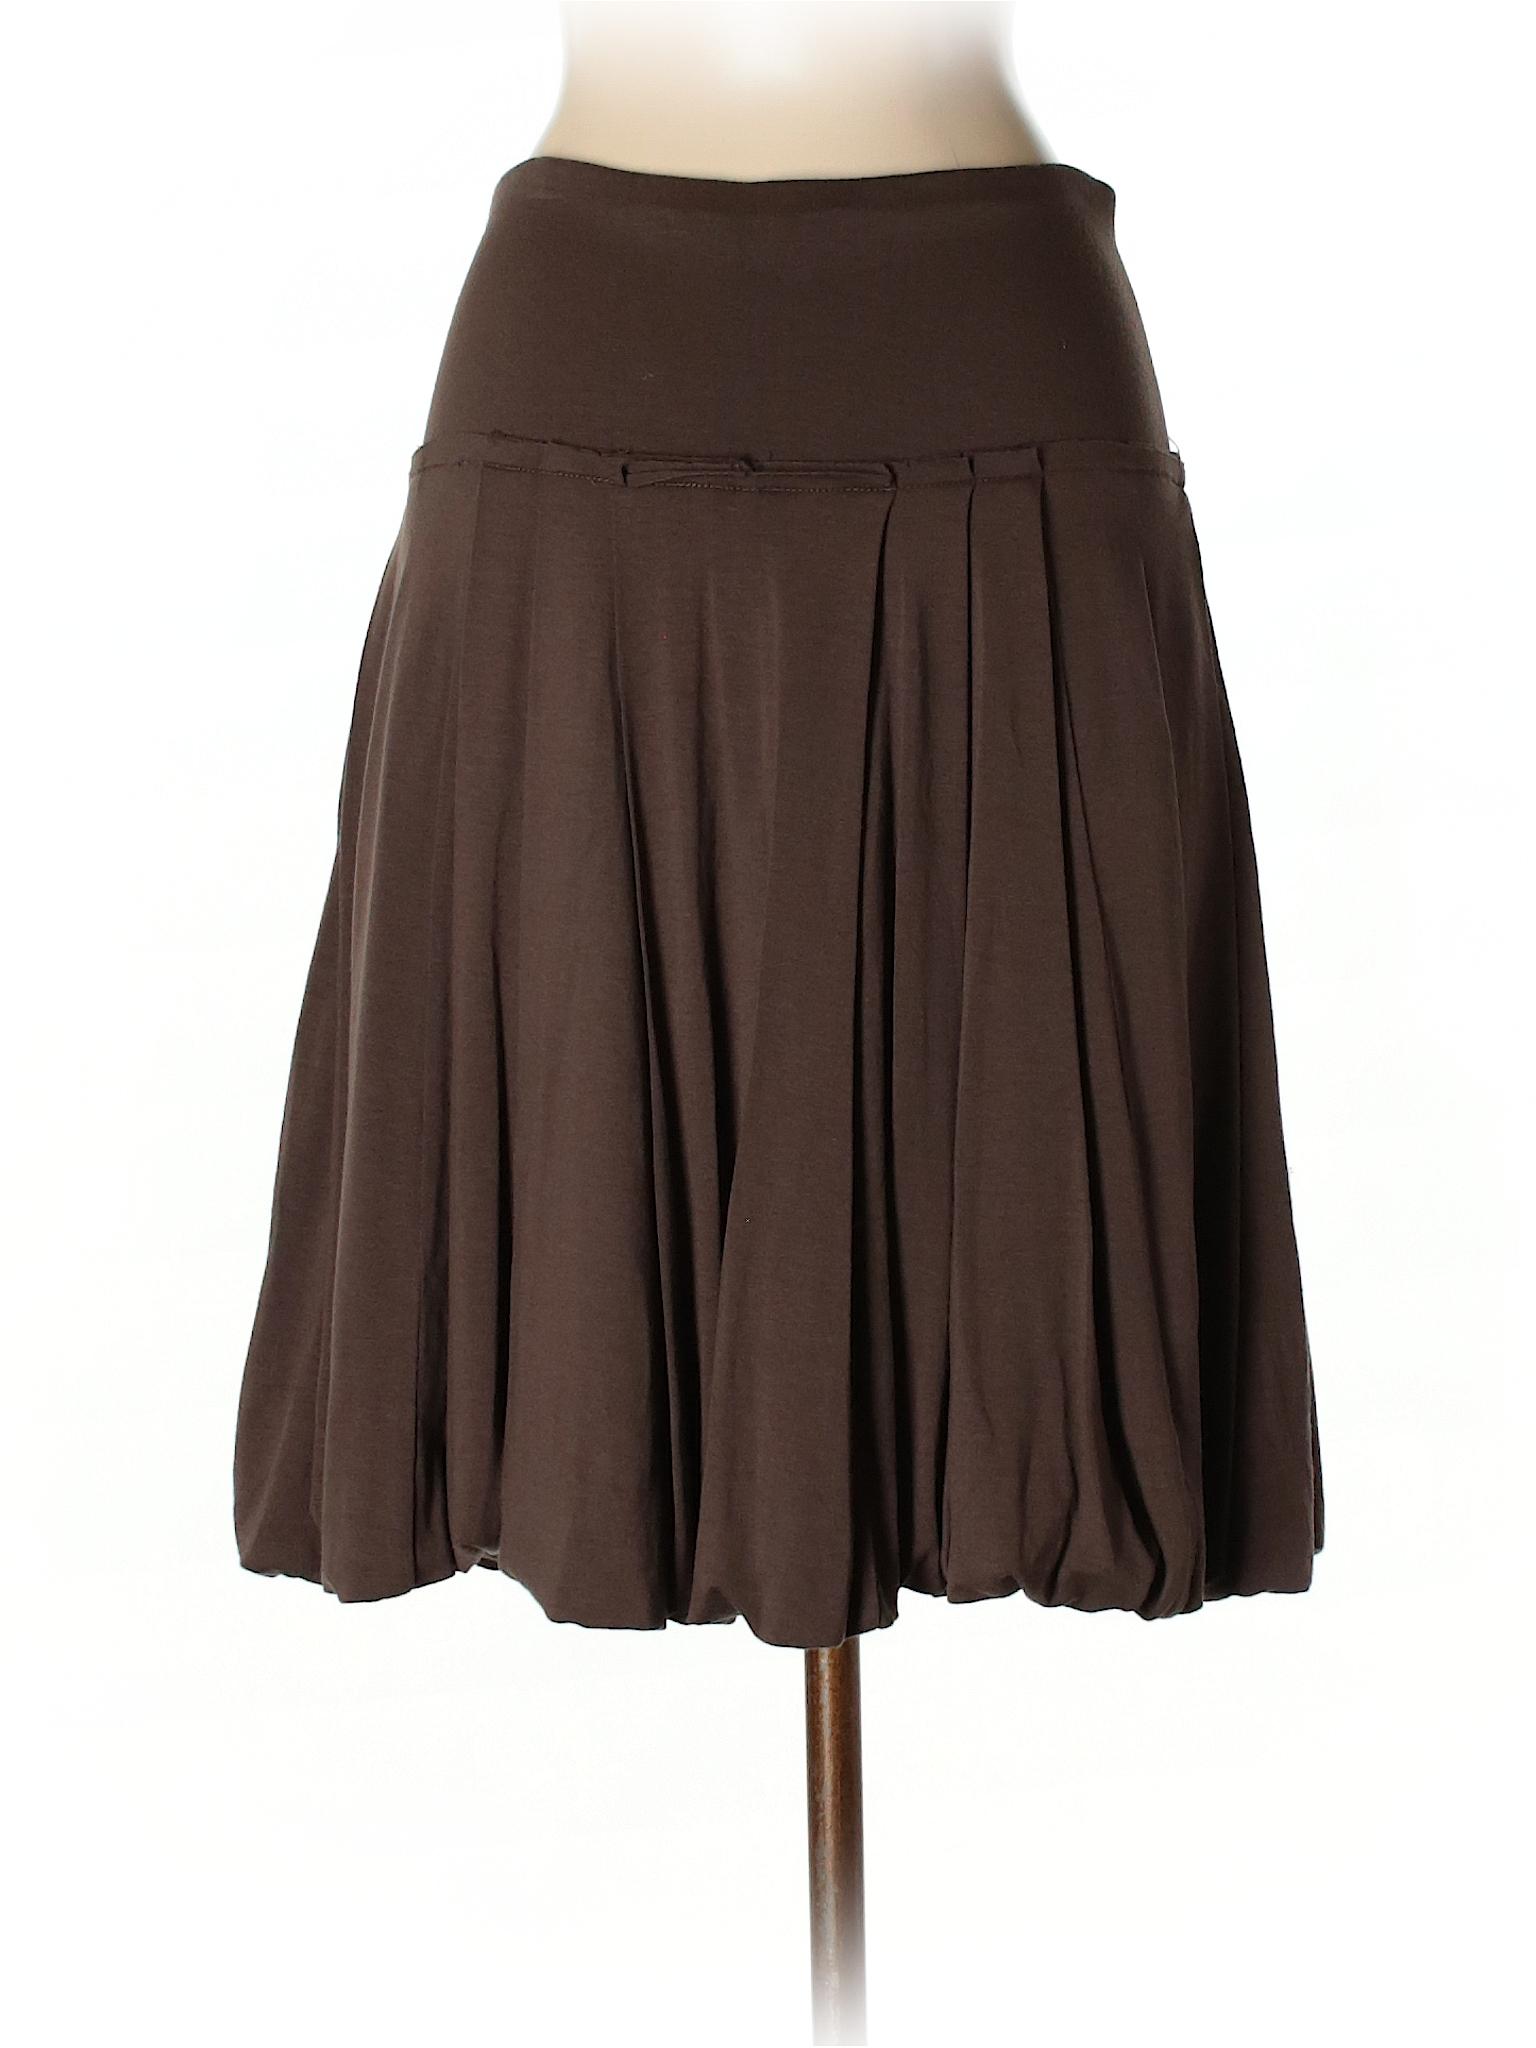 Boutique Casual Casual Casual Skirt Boutique Skirt Boutique Skirt 4wqp8qa